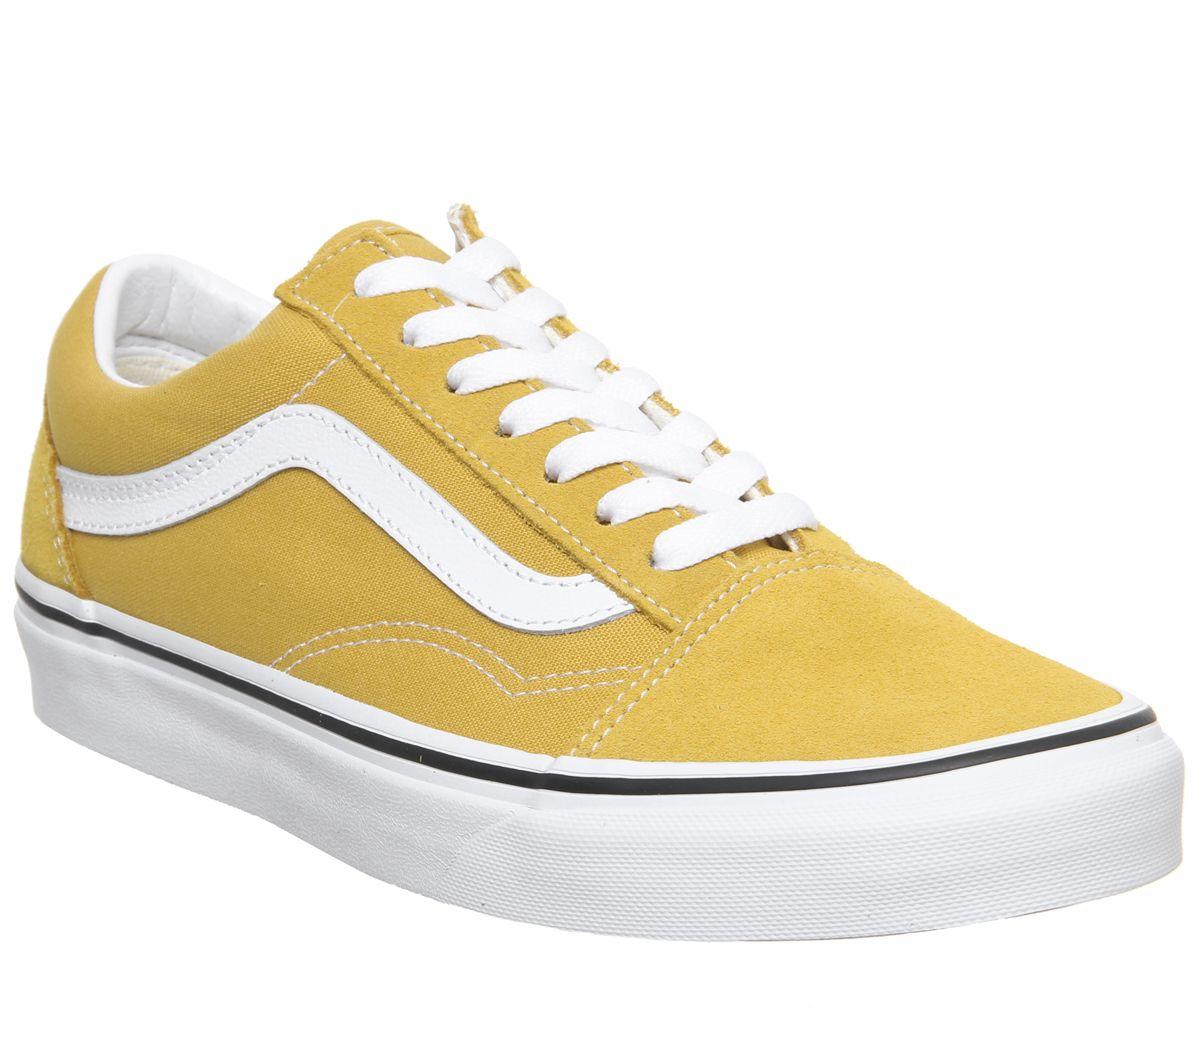 903d35c28250 Vans Old Skool Trainers Yolk Yellow True White - Unisex Sports